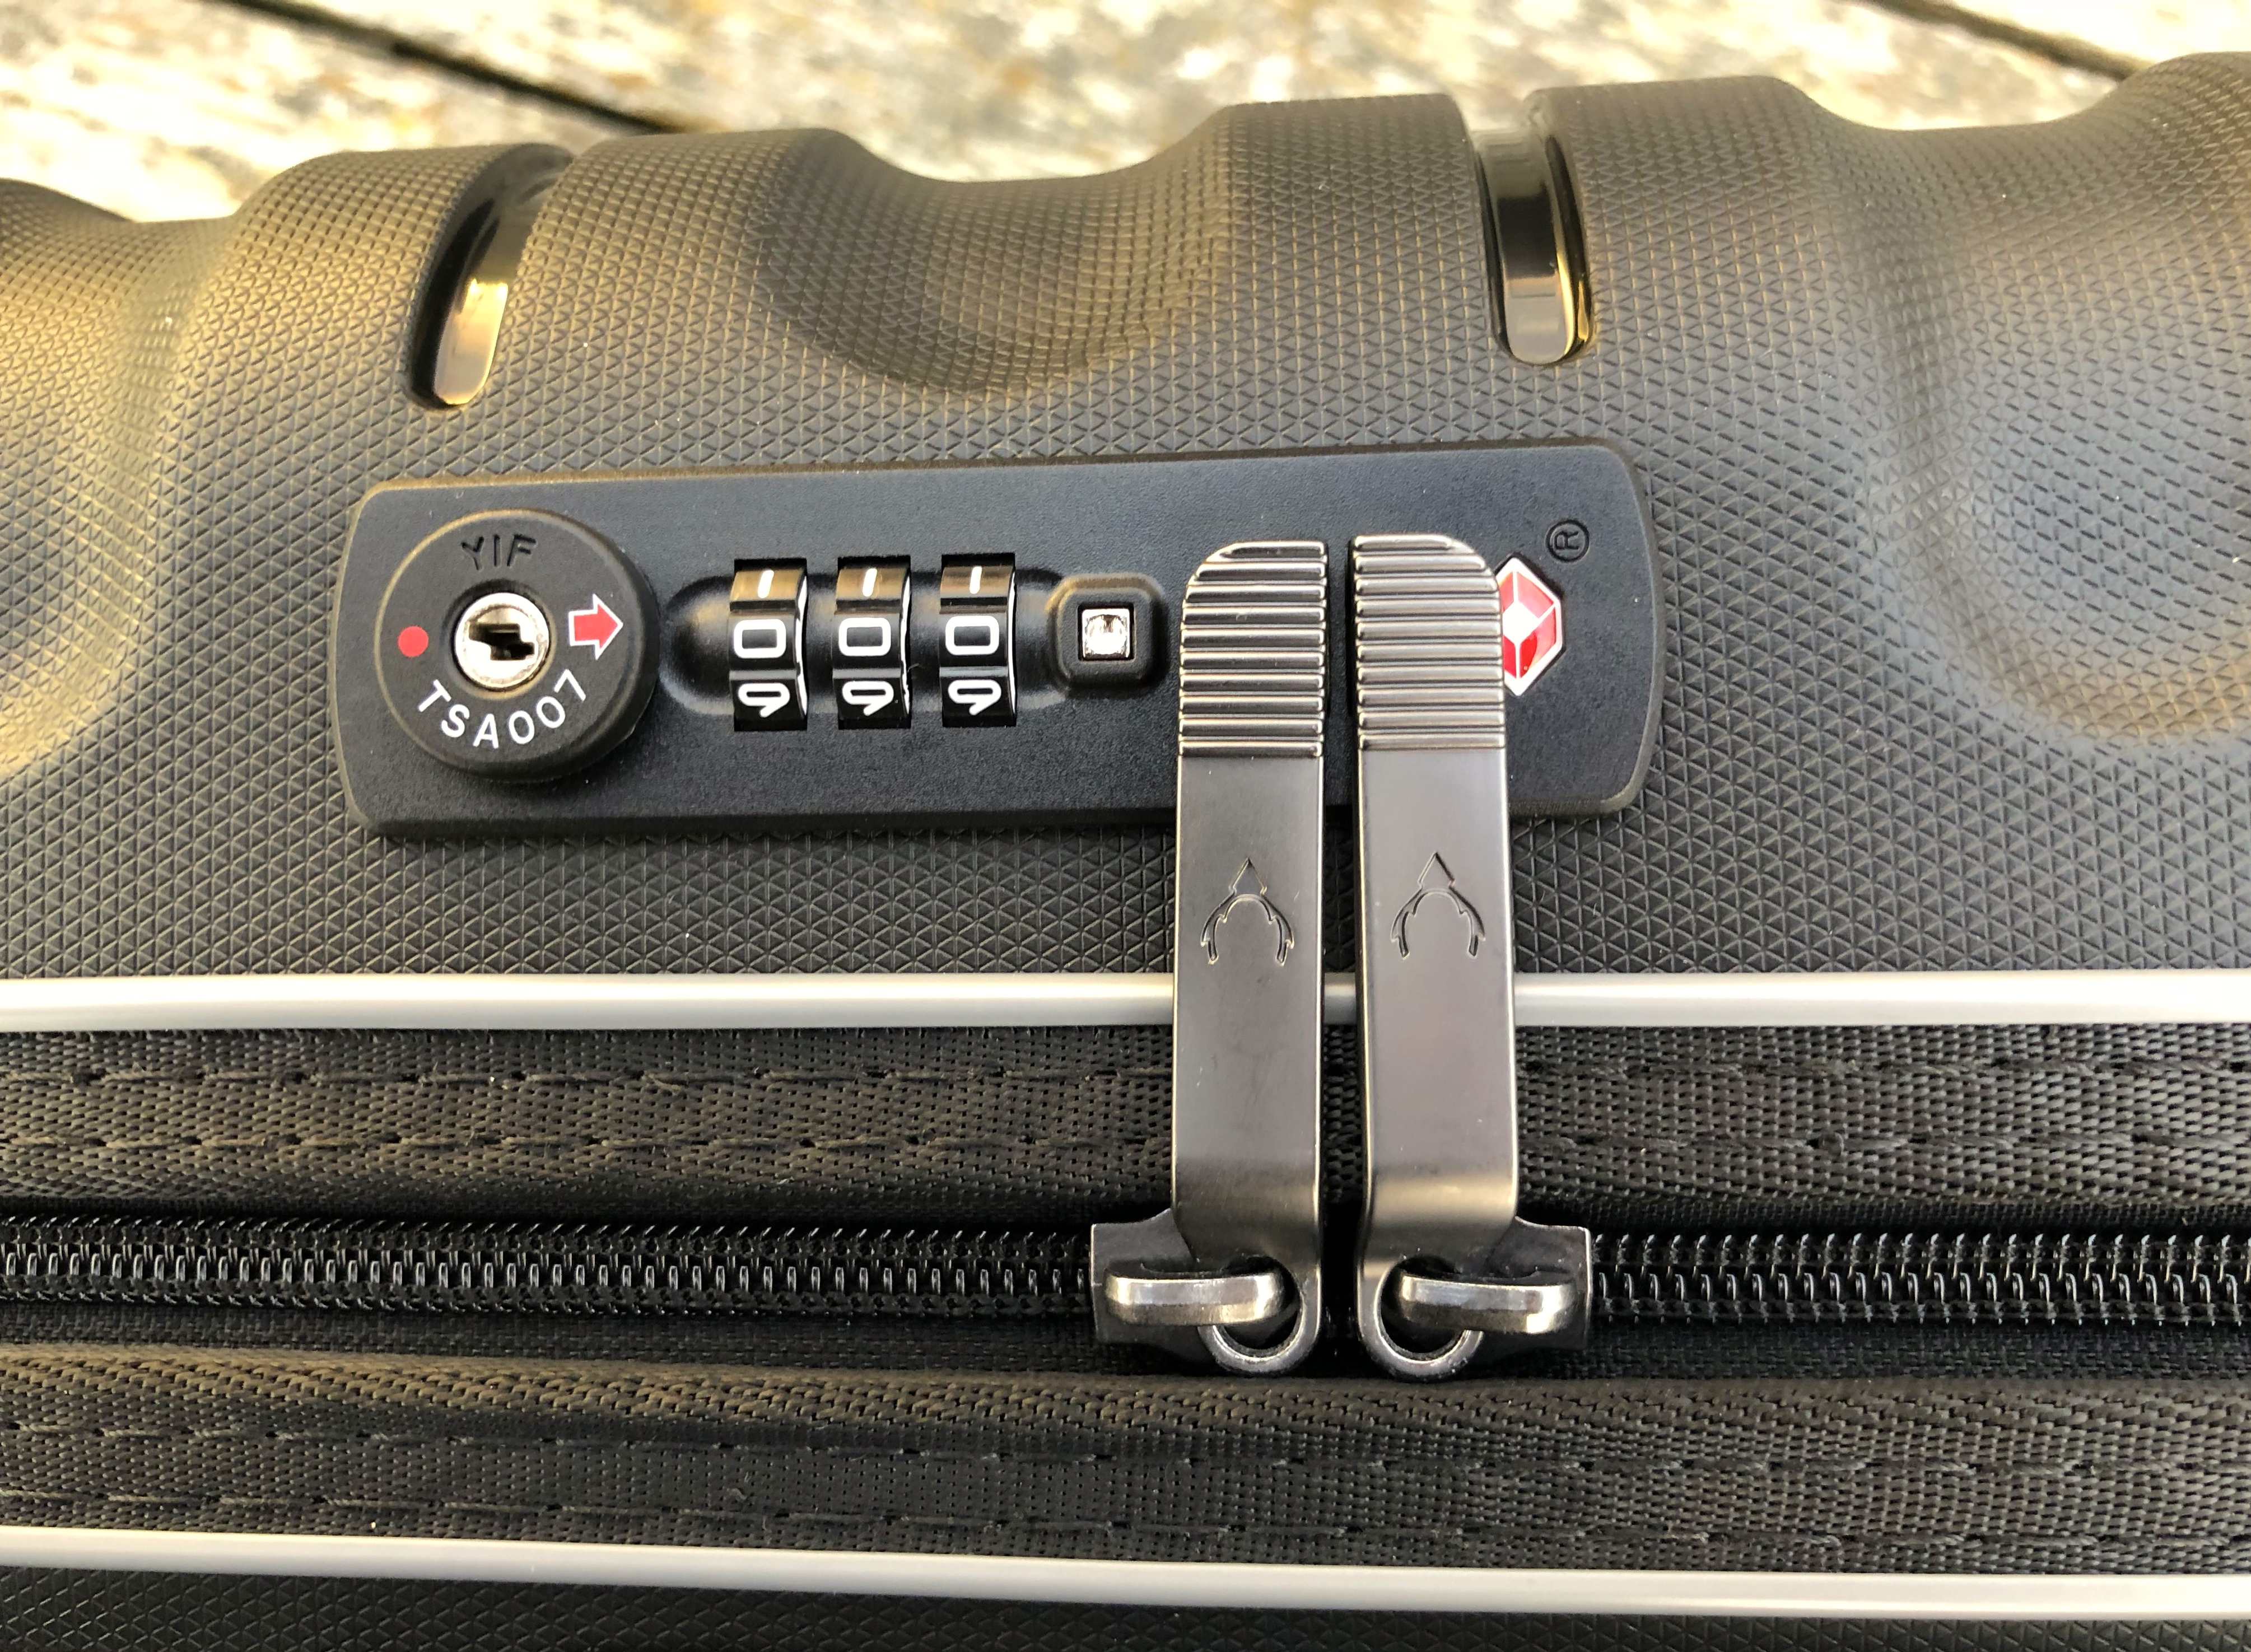 Antler Juno II suitcase set 10